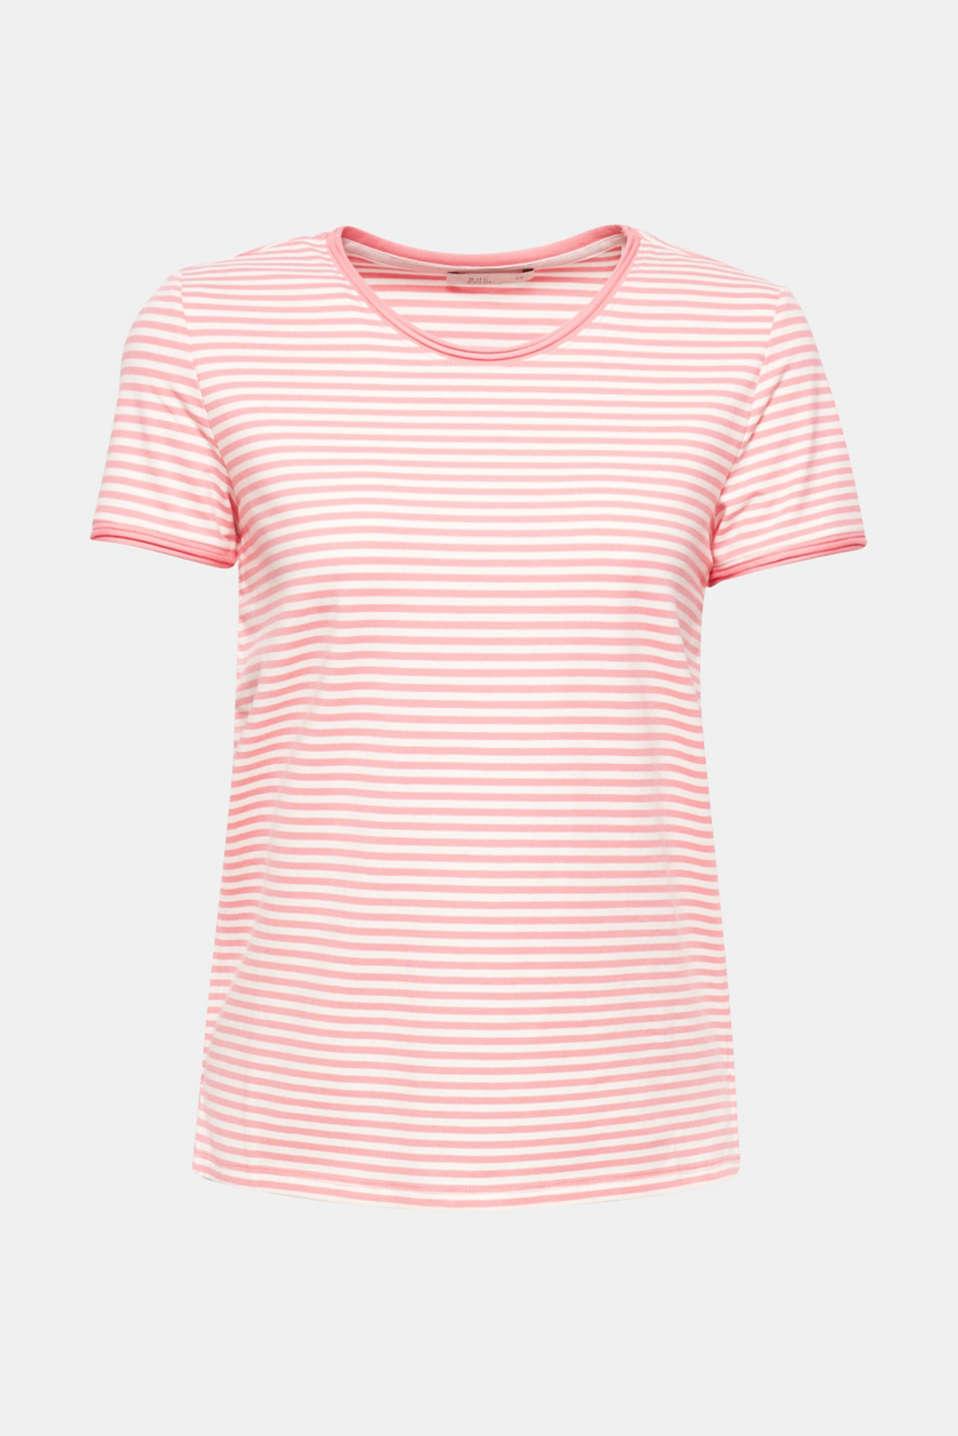 T-Shirts, PINK, detail image number 7